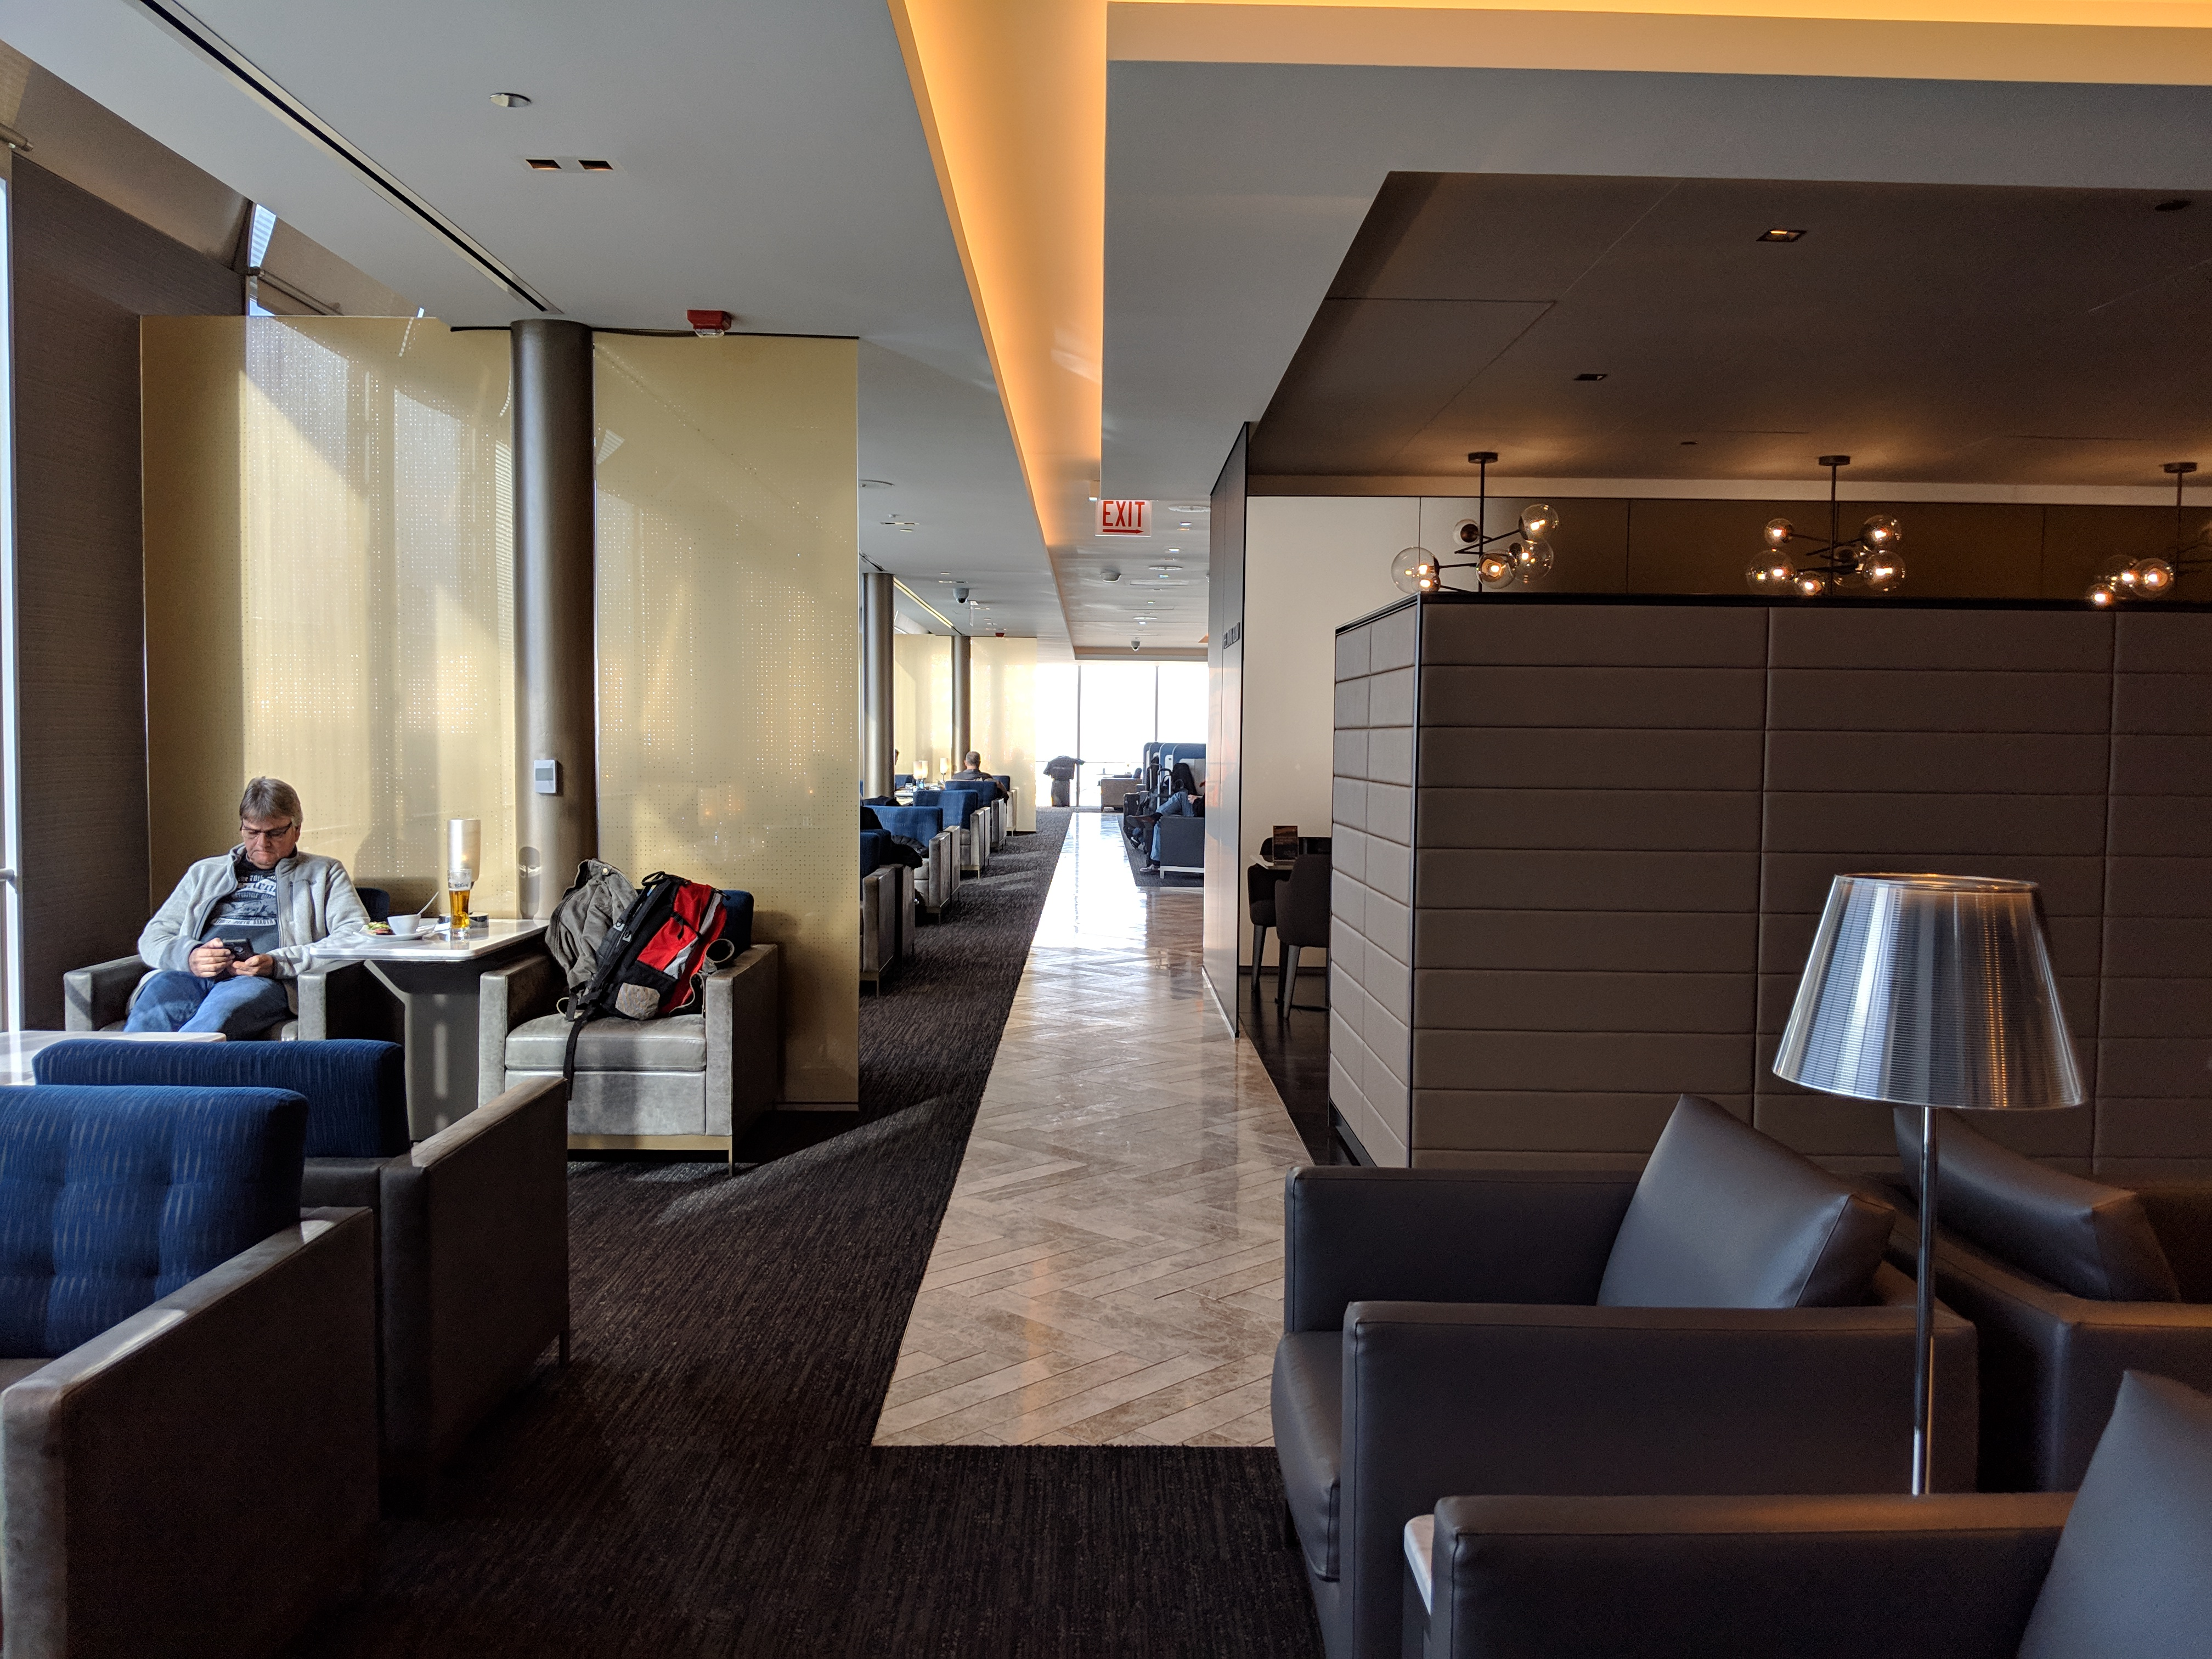 ORD United Polaris lounge.